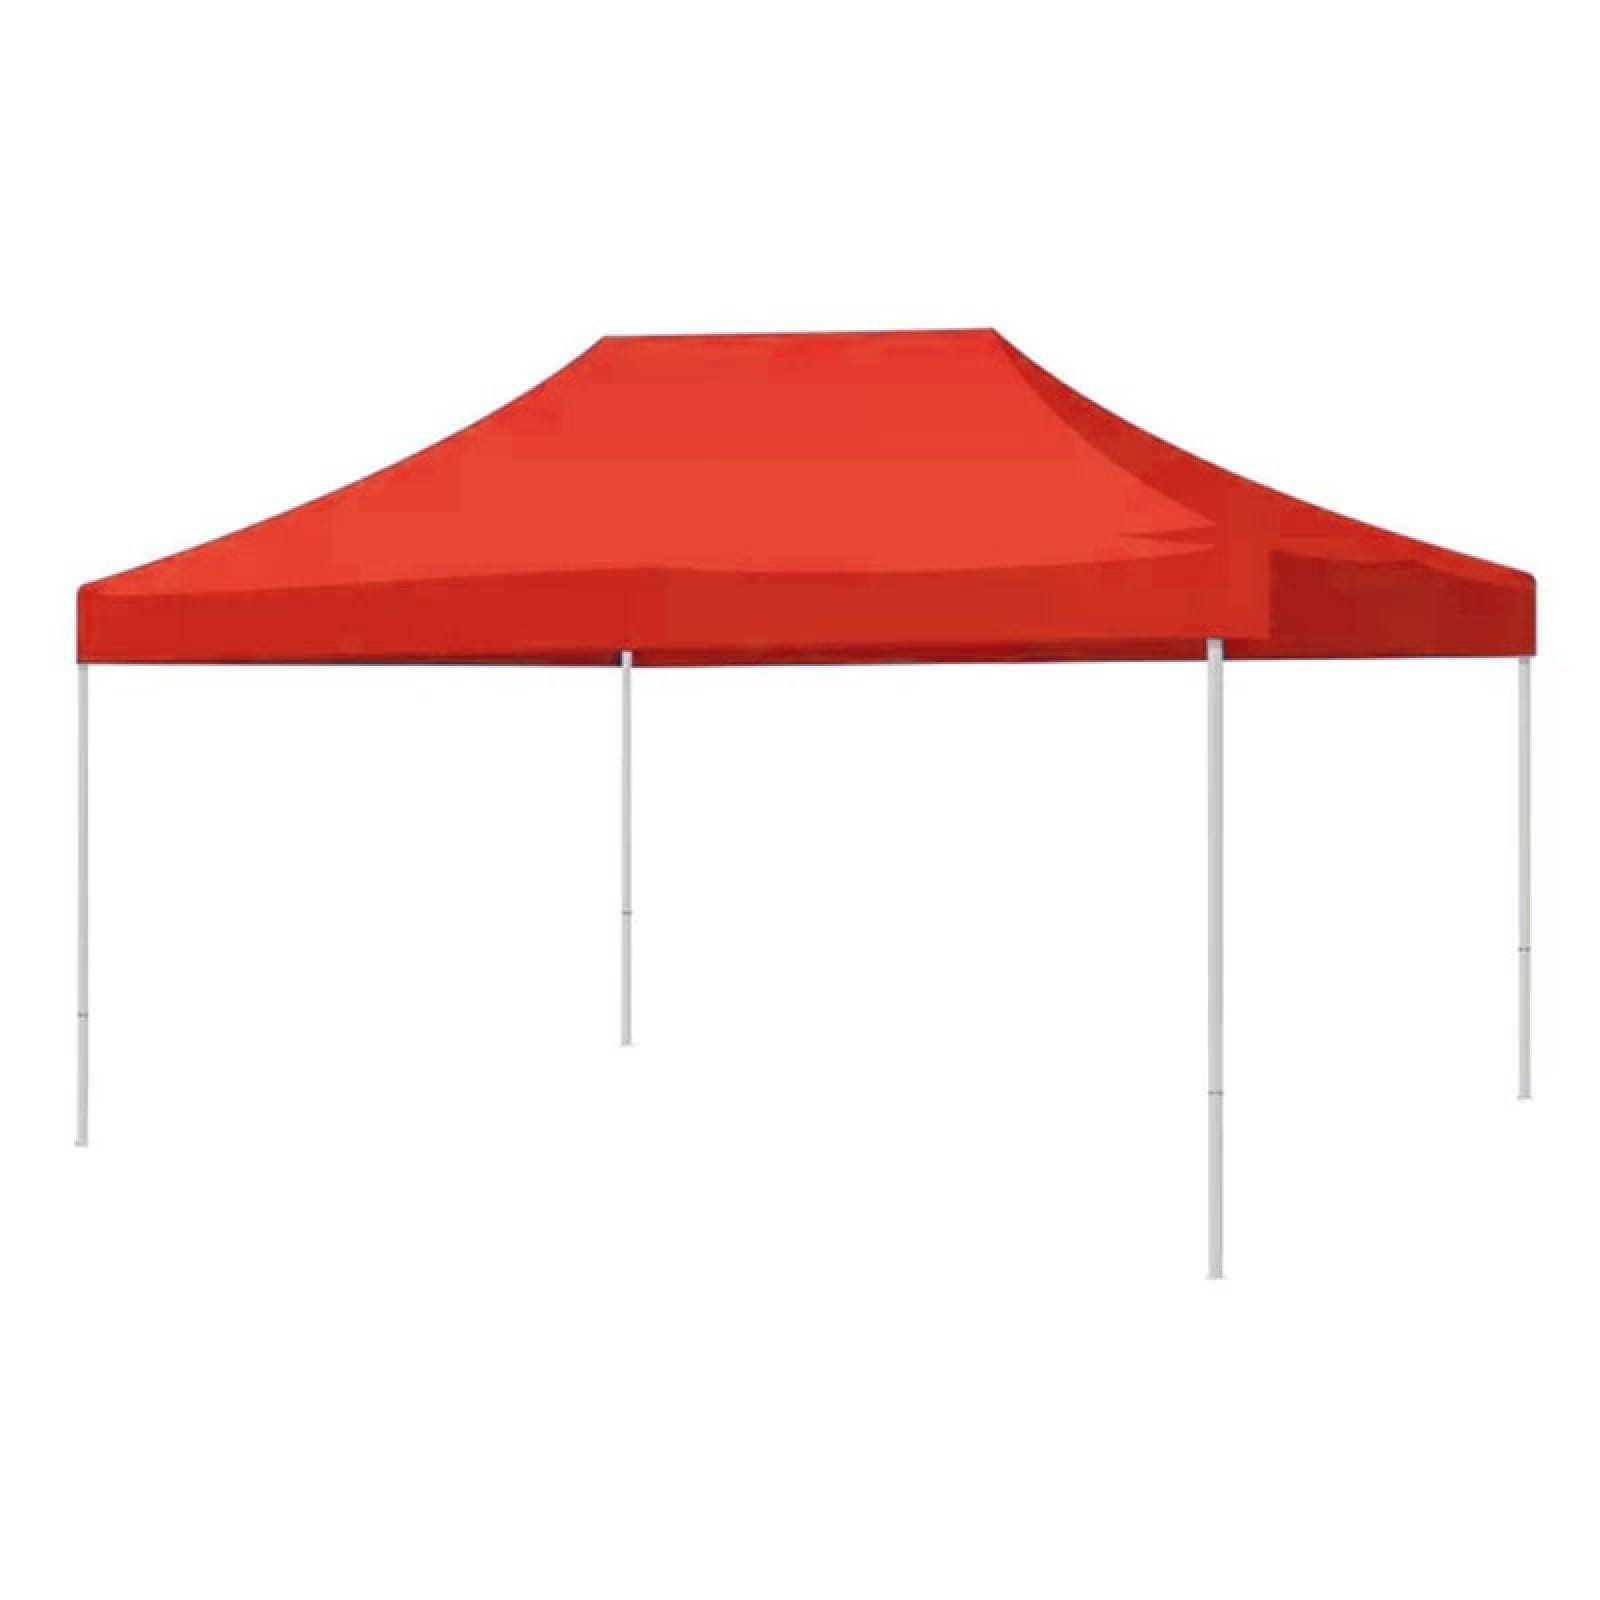 Carpa Toldo 2x3 Roja Plegable Impermeable Negocio Jardin Eventos